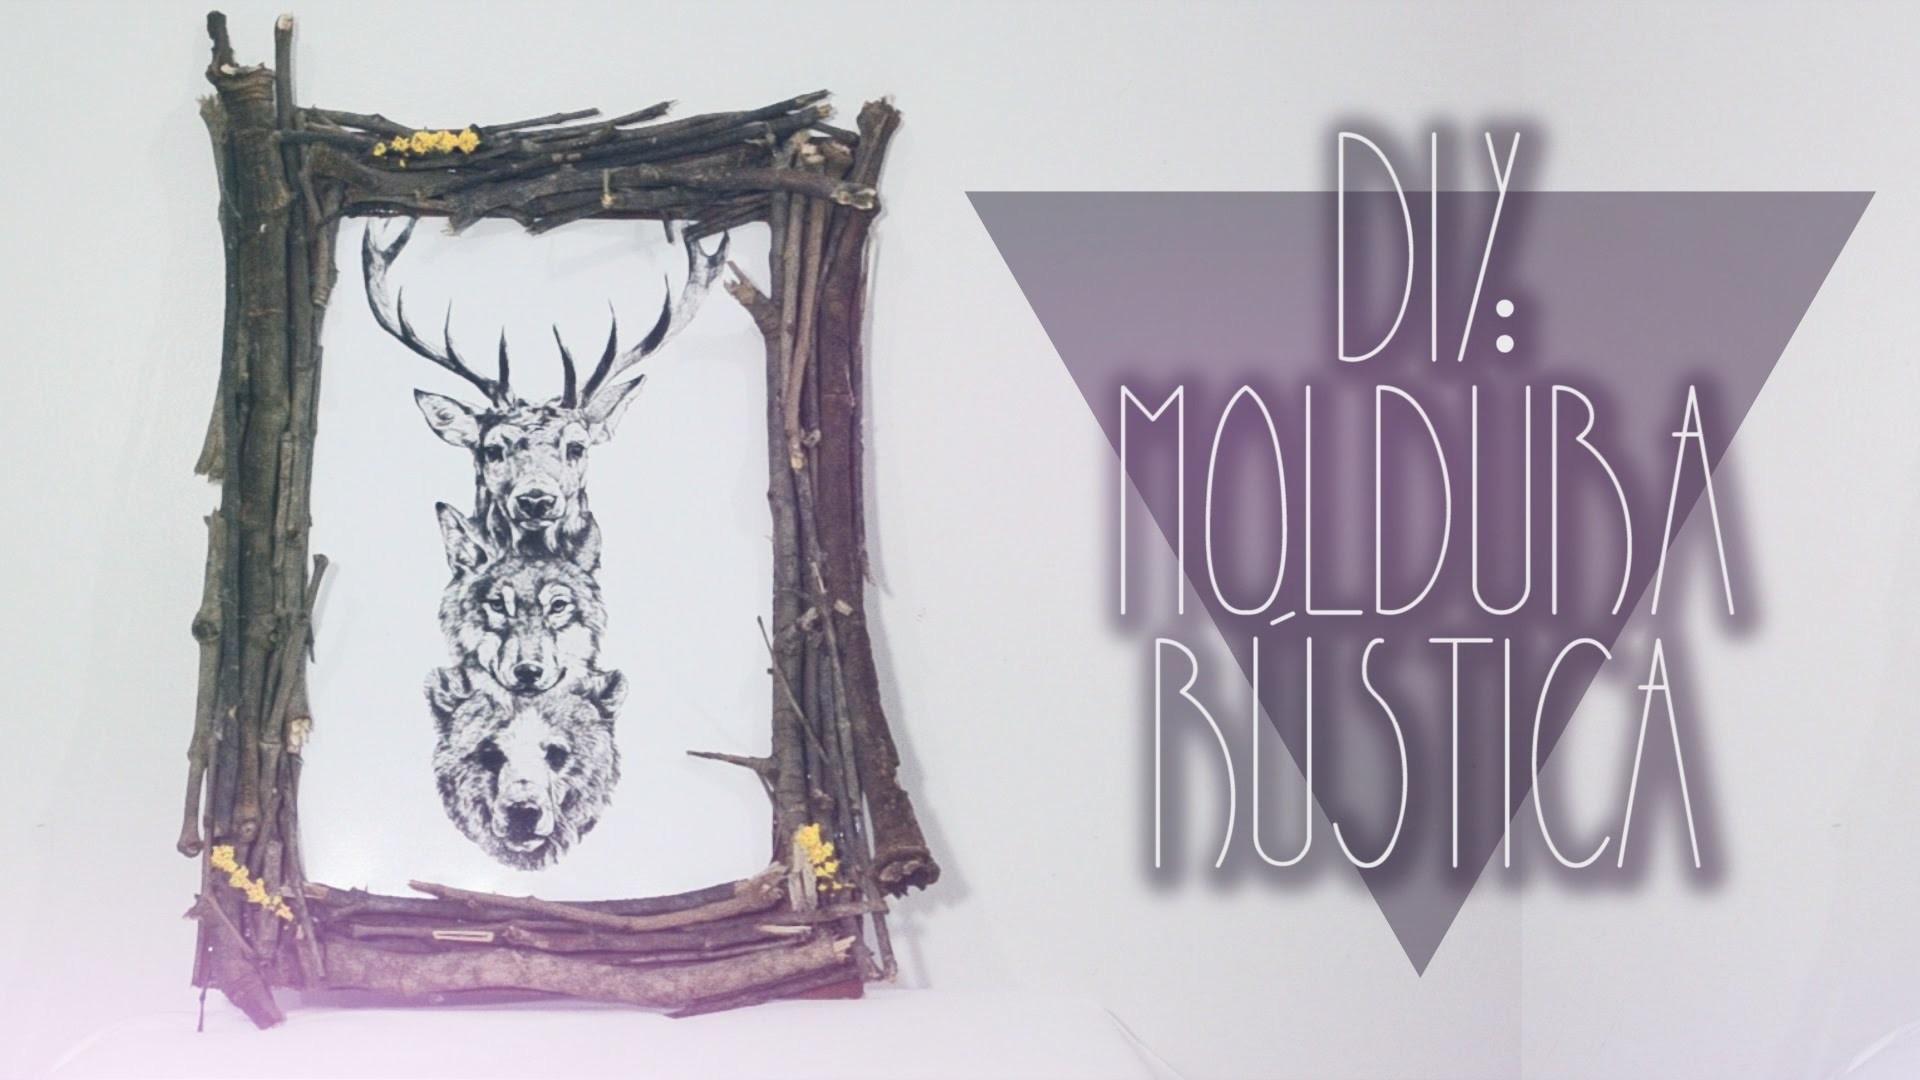 DIY: Moldura Rústica |  Rustic Frame